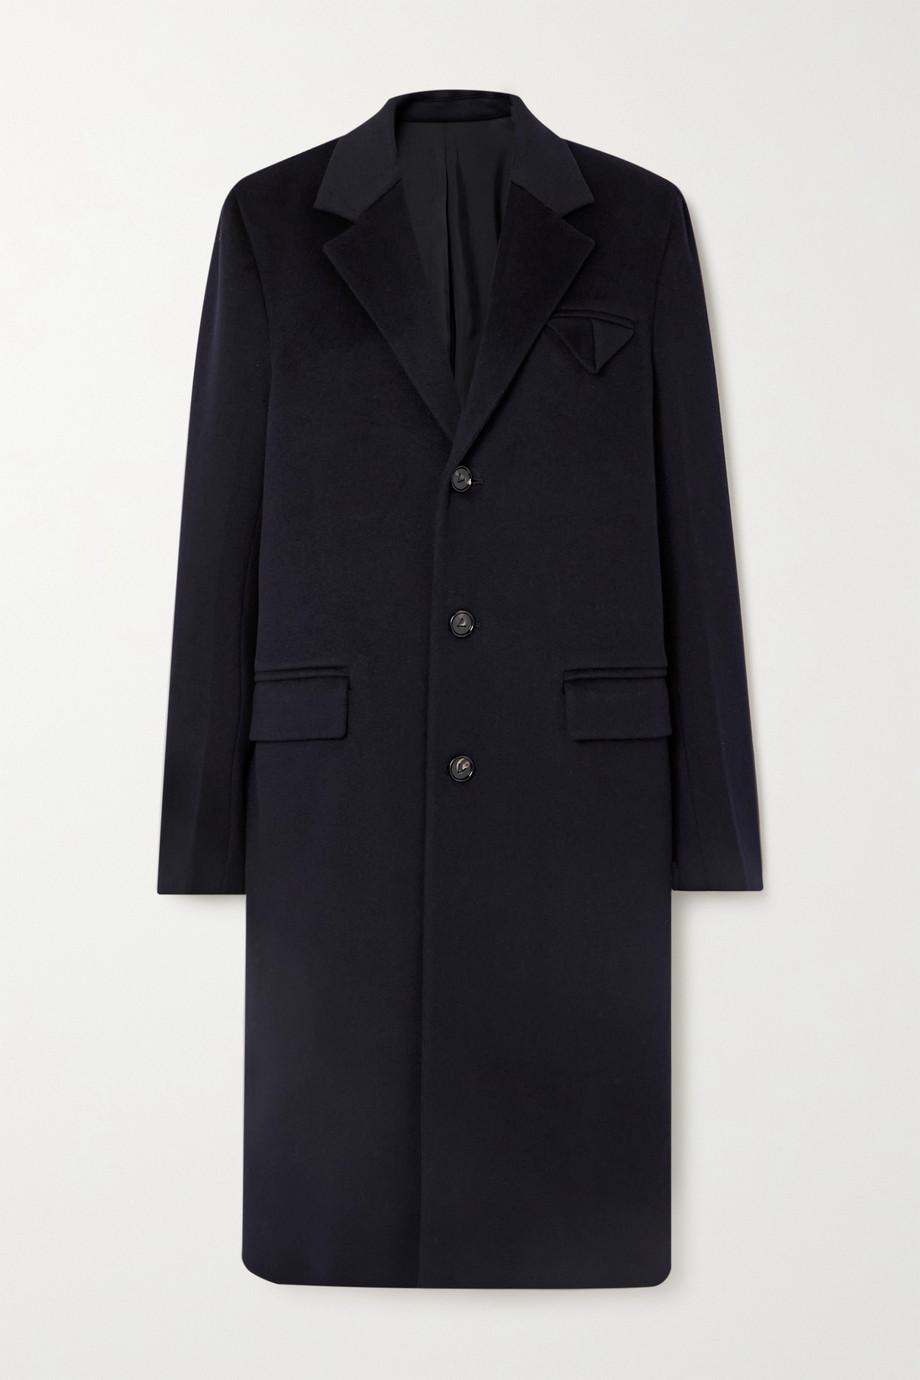 Bottega Veneta Wool and cashmere-blend coat